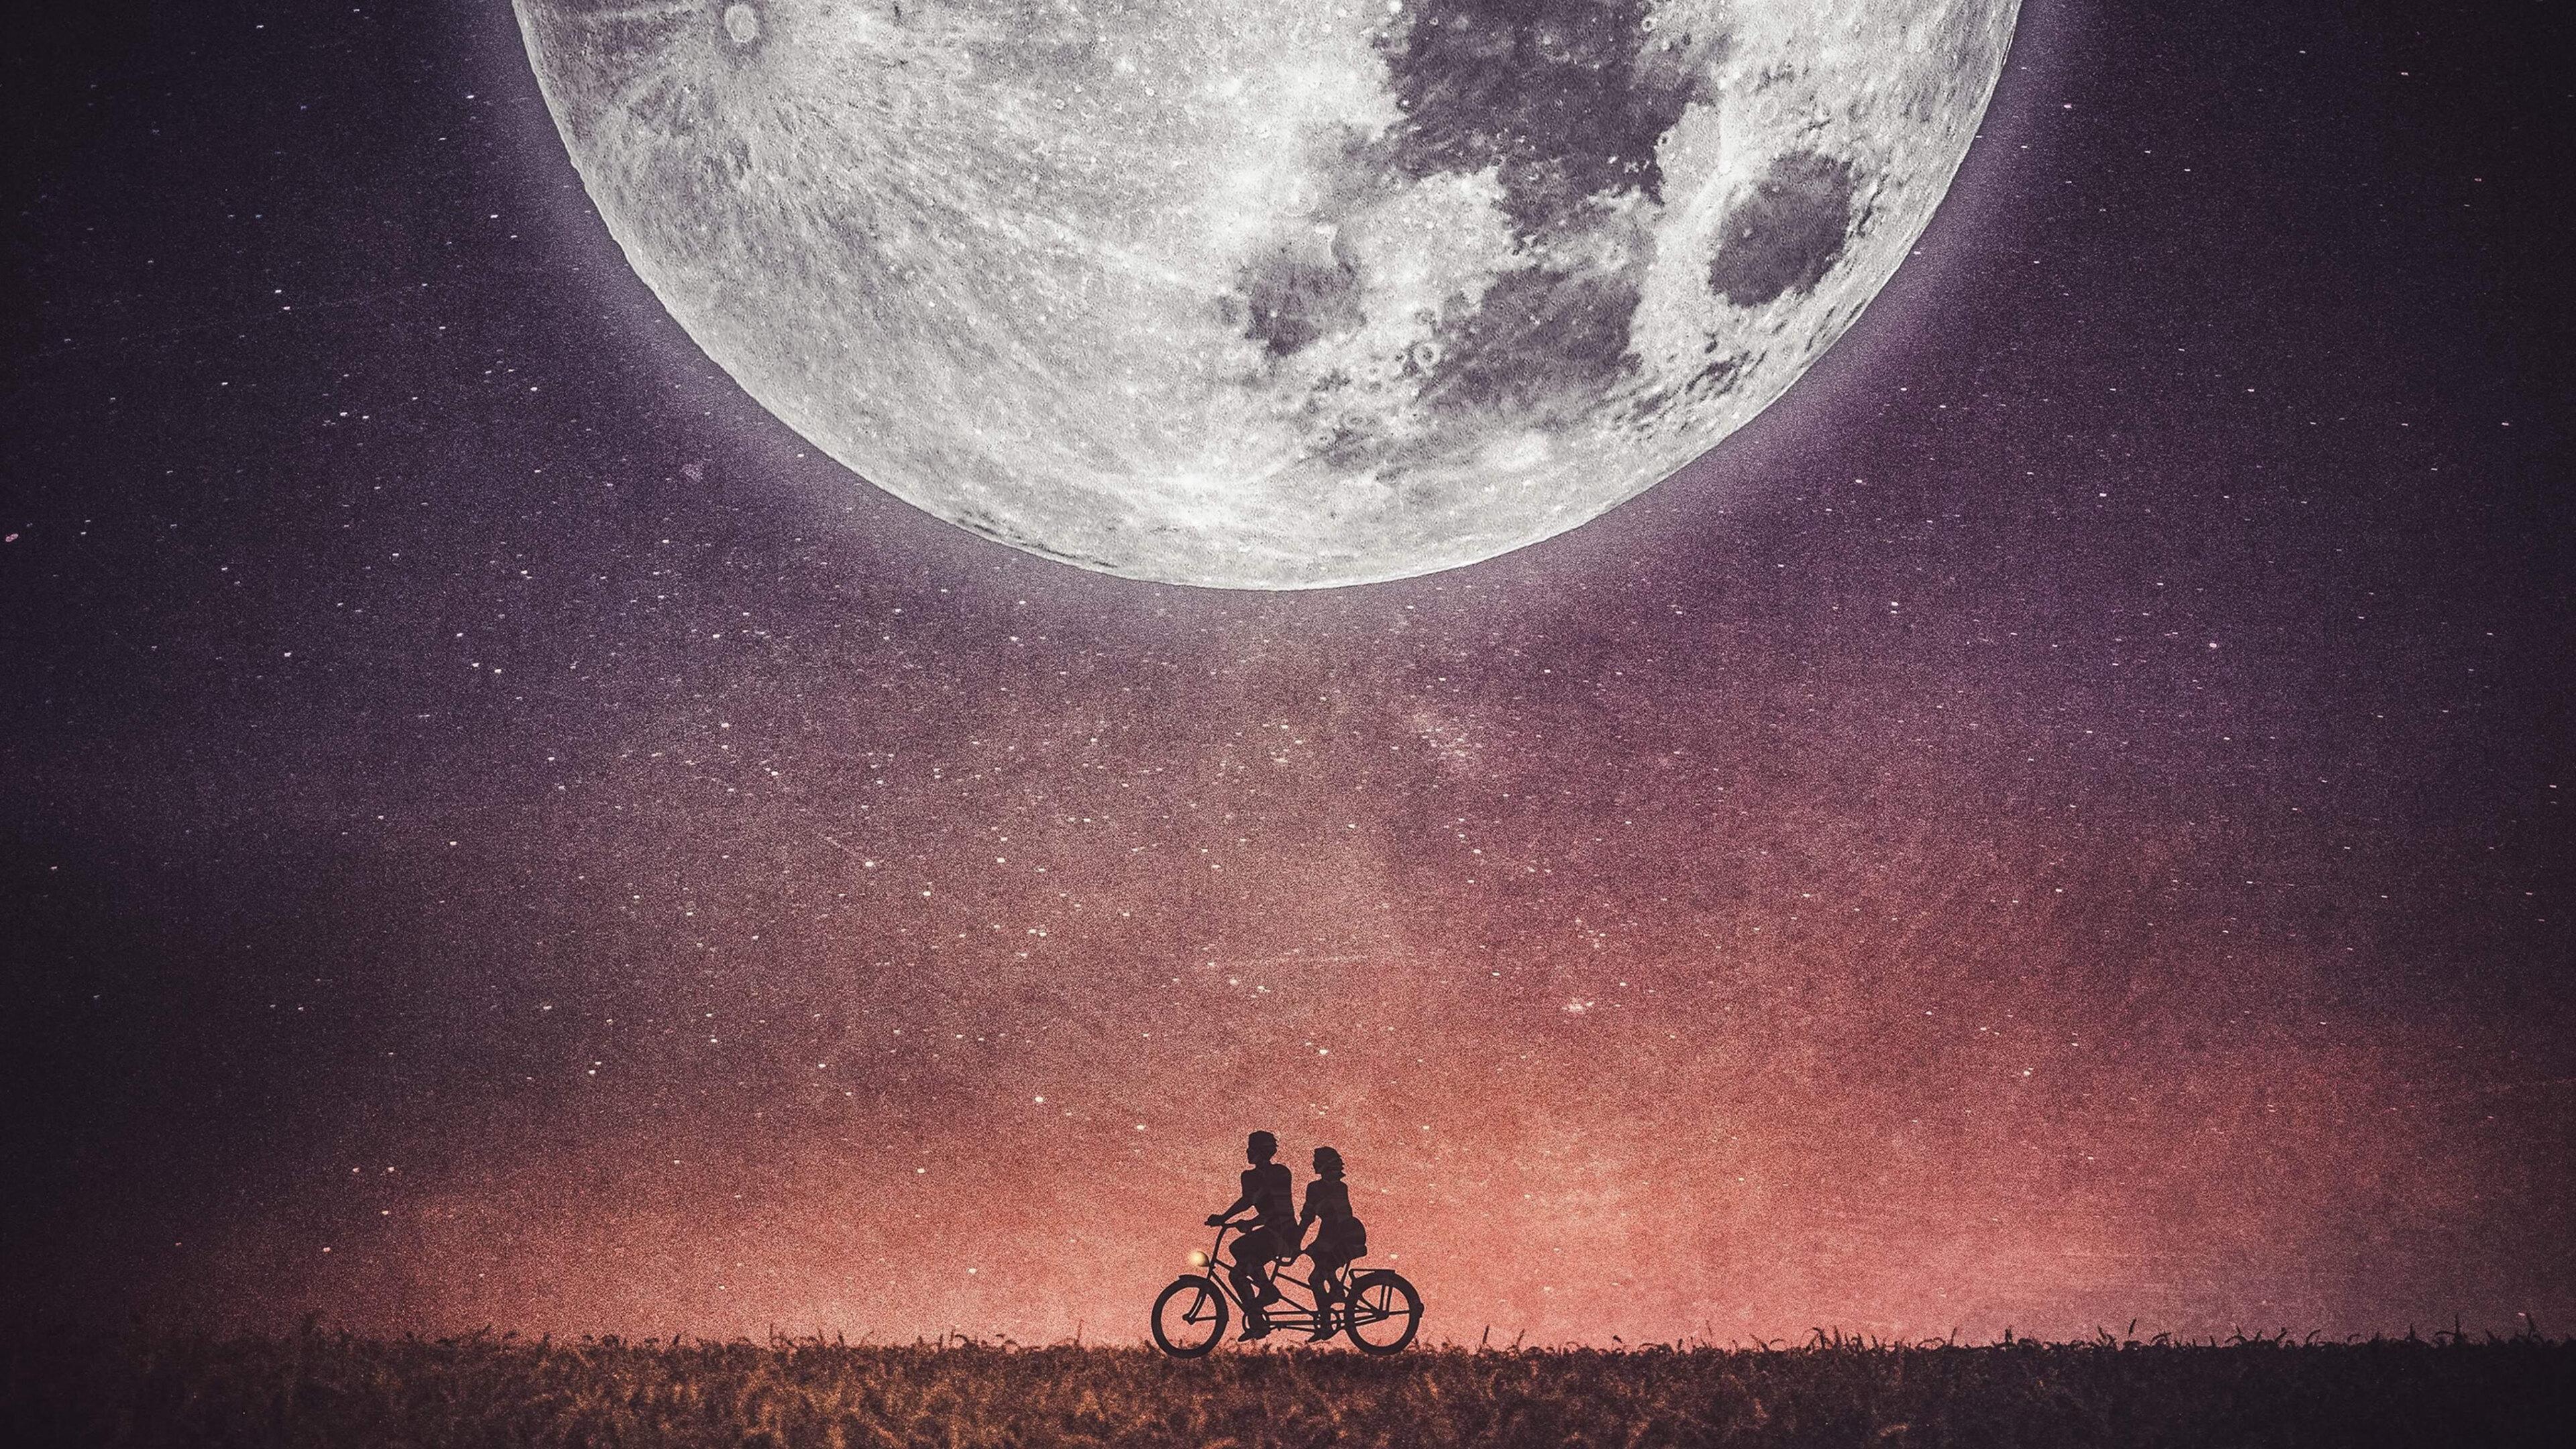 couple-on-cycle-ao.jpg